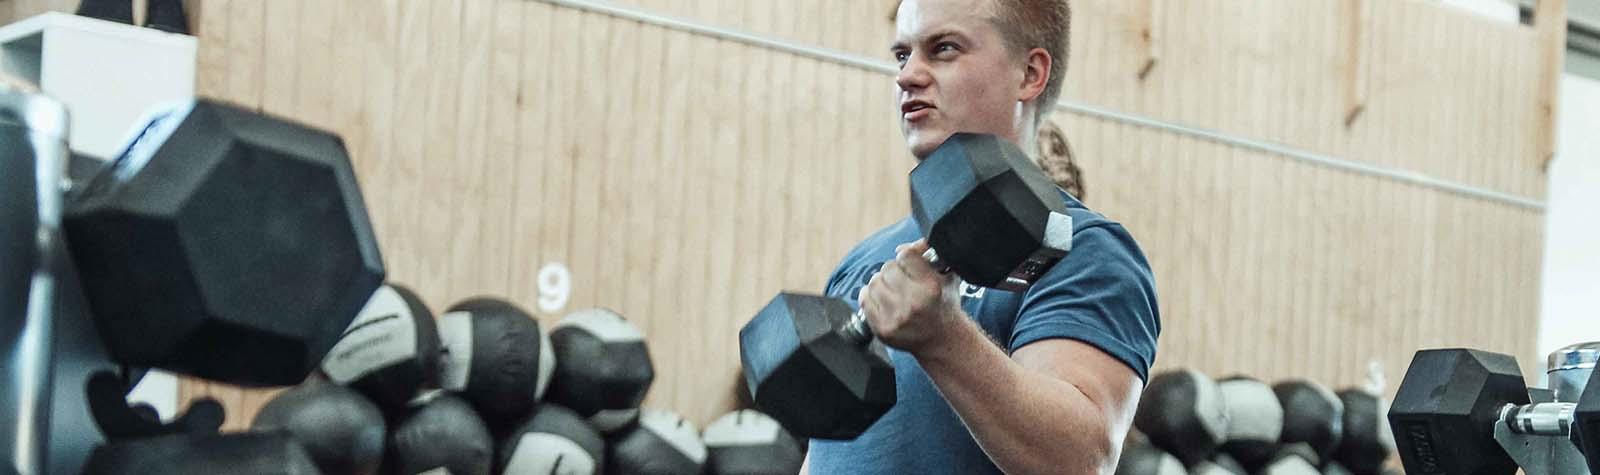 5 Grunde til at du ikke bygger muskler